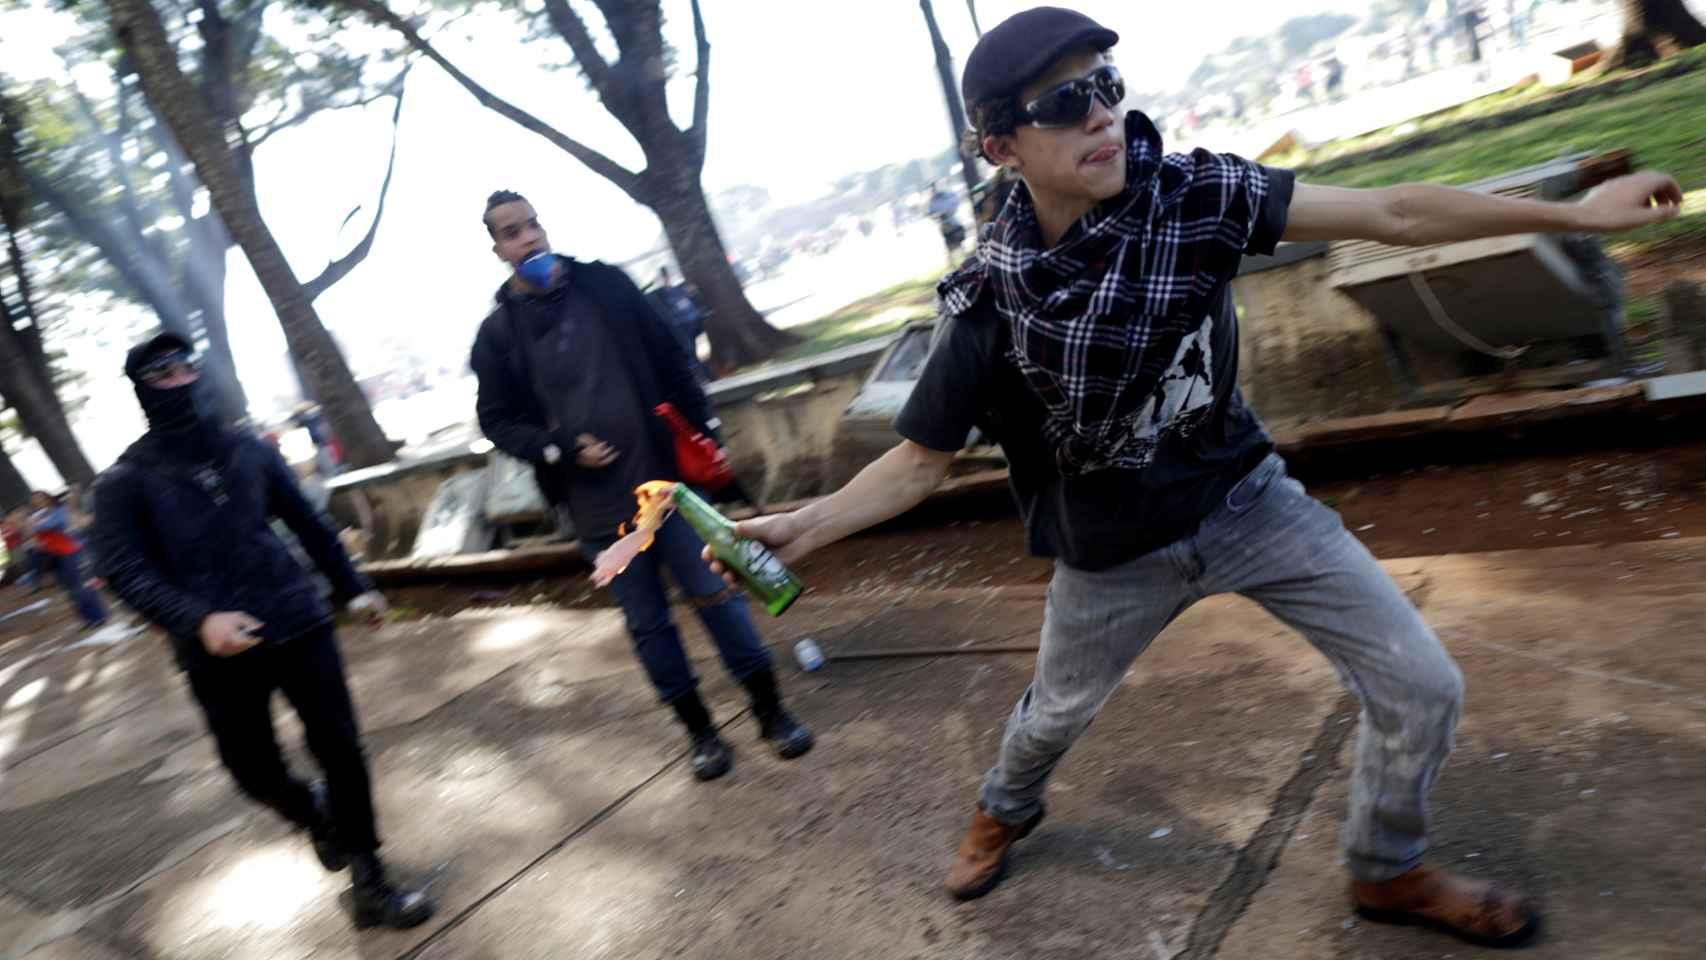 Cócteles molotov y barricadas: Brasilia protesta contra Temer